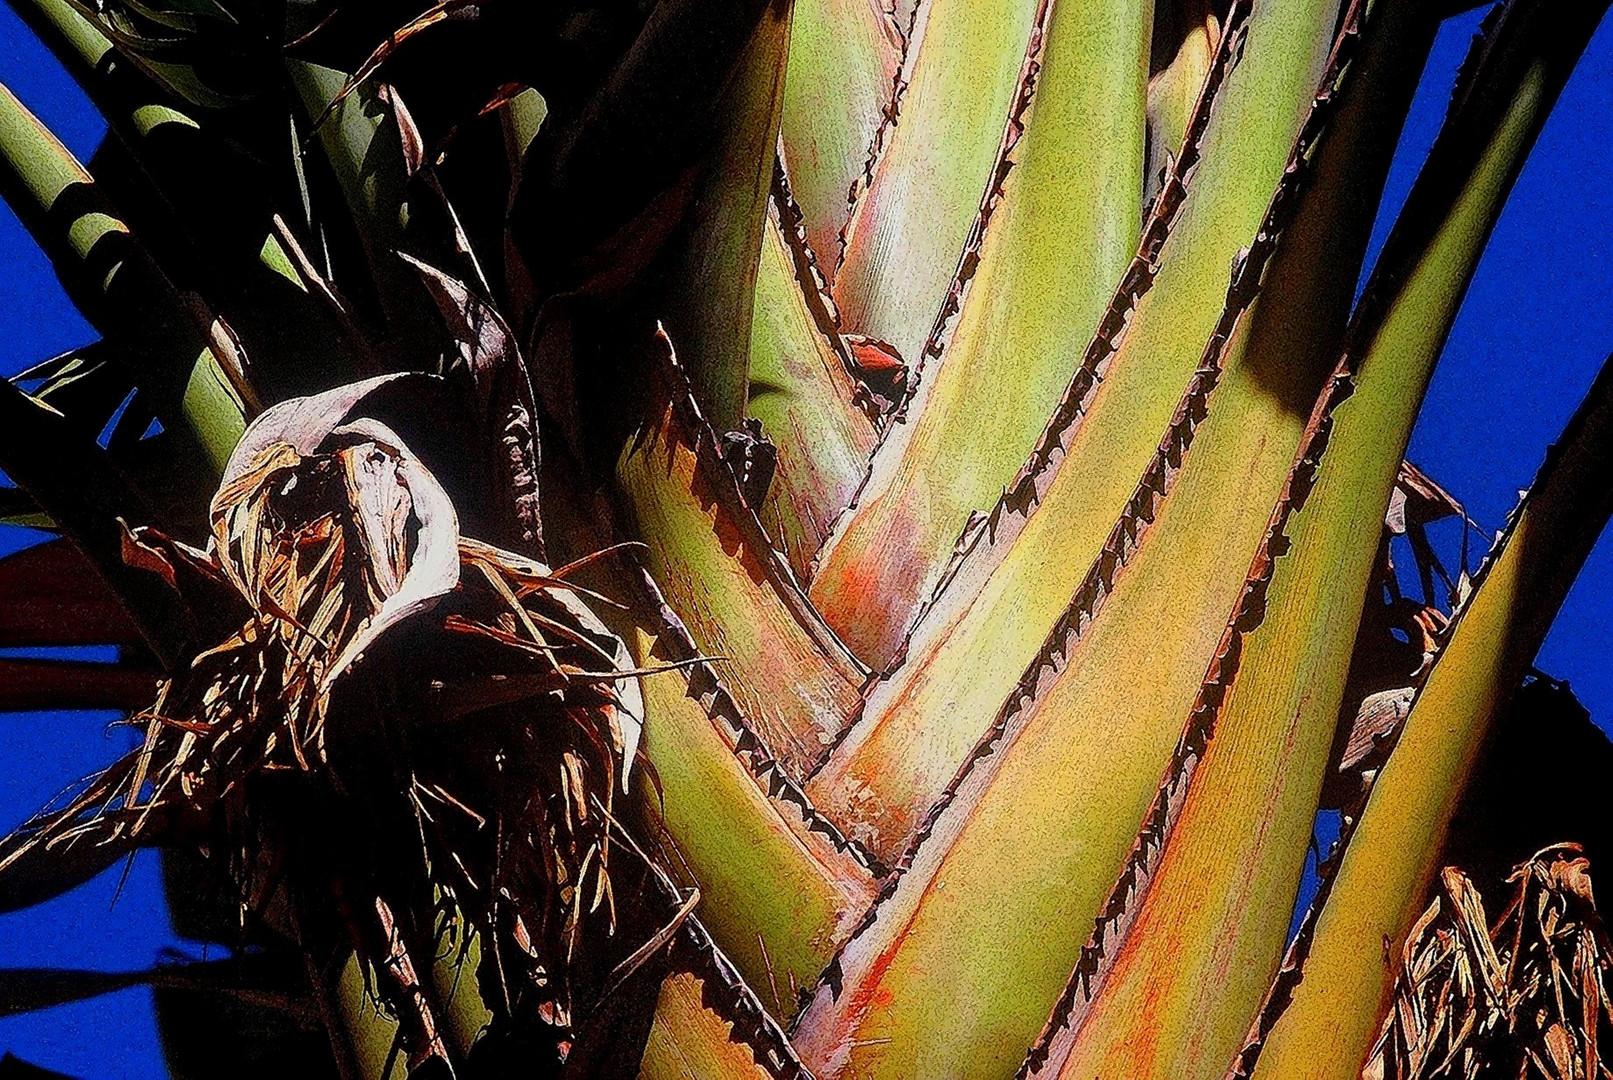 Plante grasse dans un jardin marocain